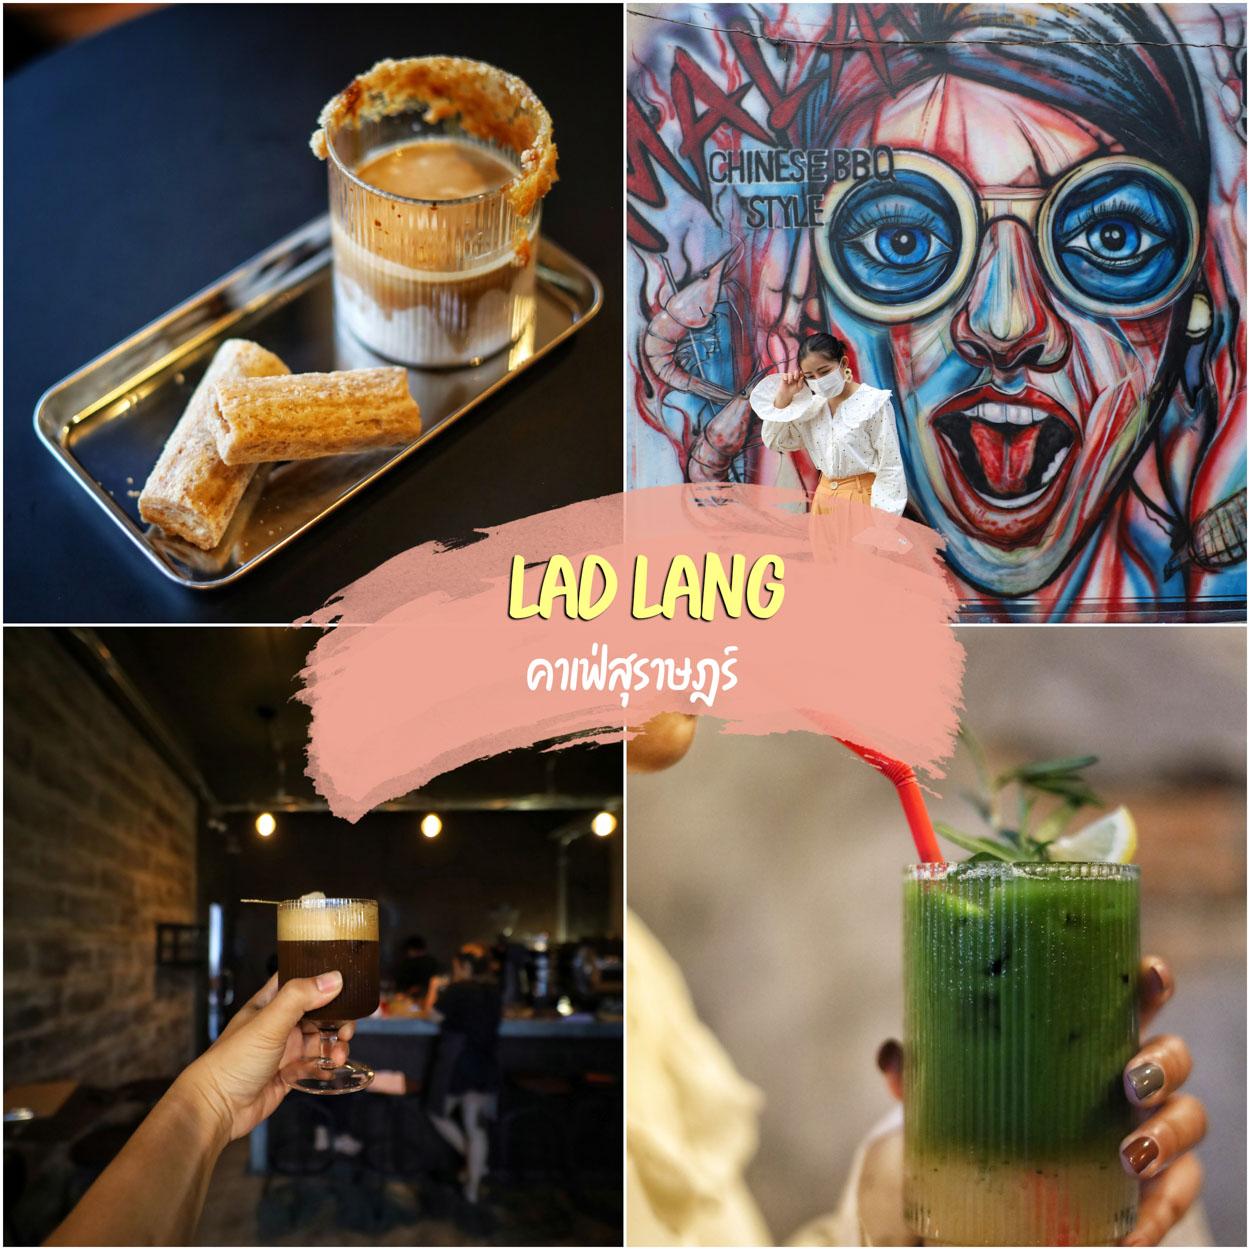 Cafe คาเฟ่สุราษฎร์  LAD LANG - Home Brewing [ ห ล า ด ล่ า ง ] สุราษฏร์ธานี